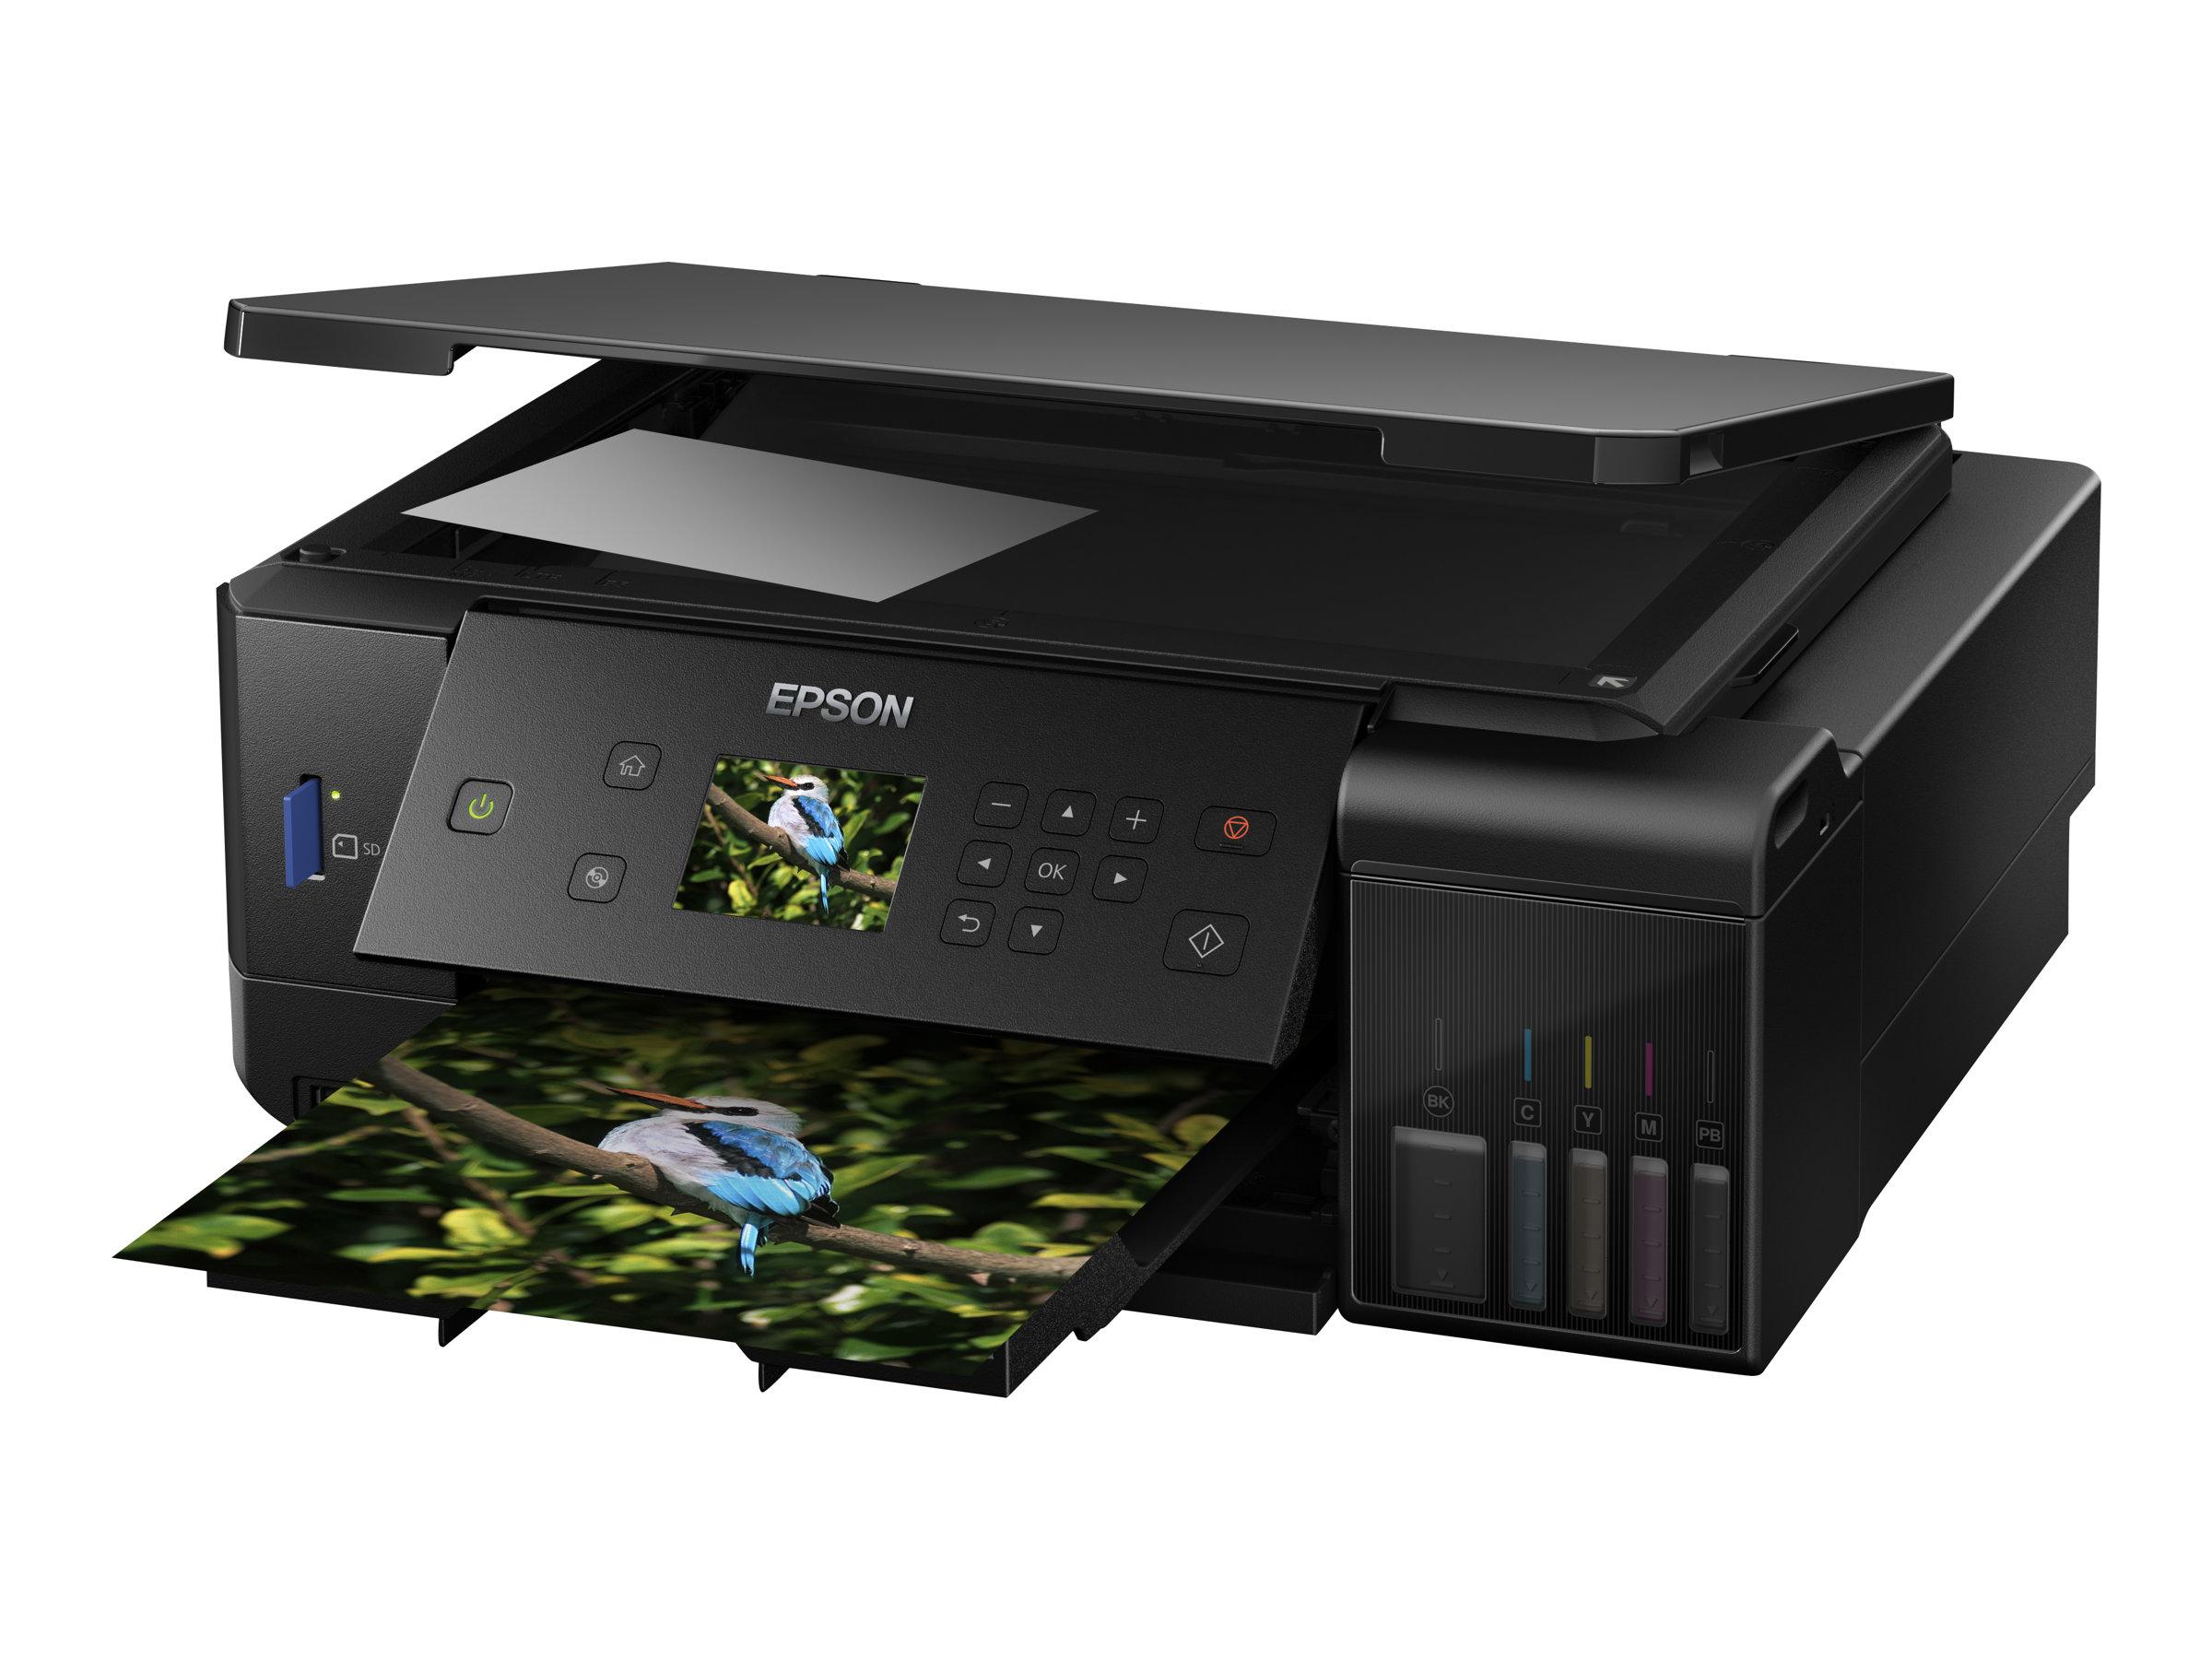 Epson EcoTank ET-7700 - Multifunktionsdrucker - Farbe - Tintenstrahl - A4/Legal (Medien)